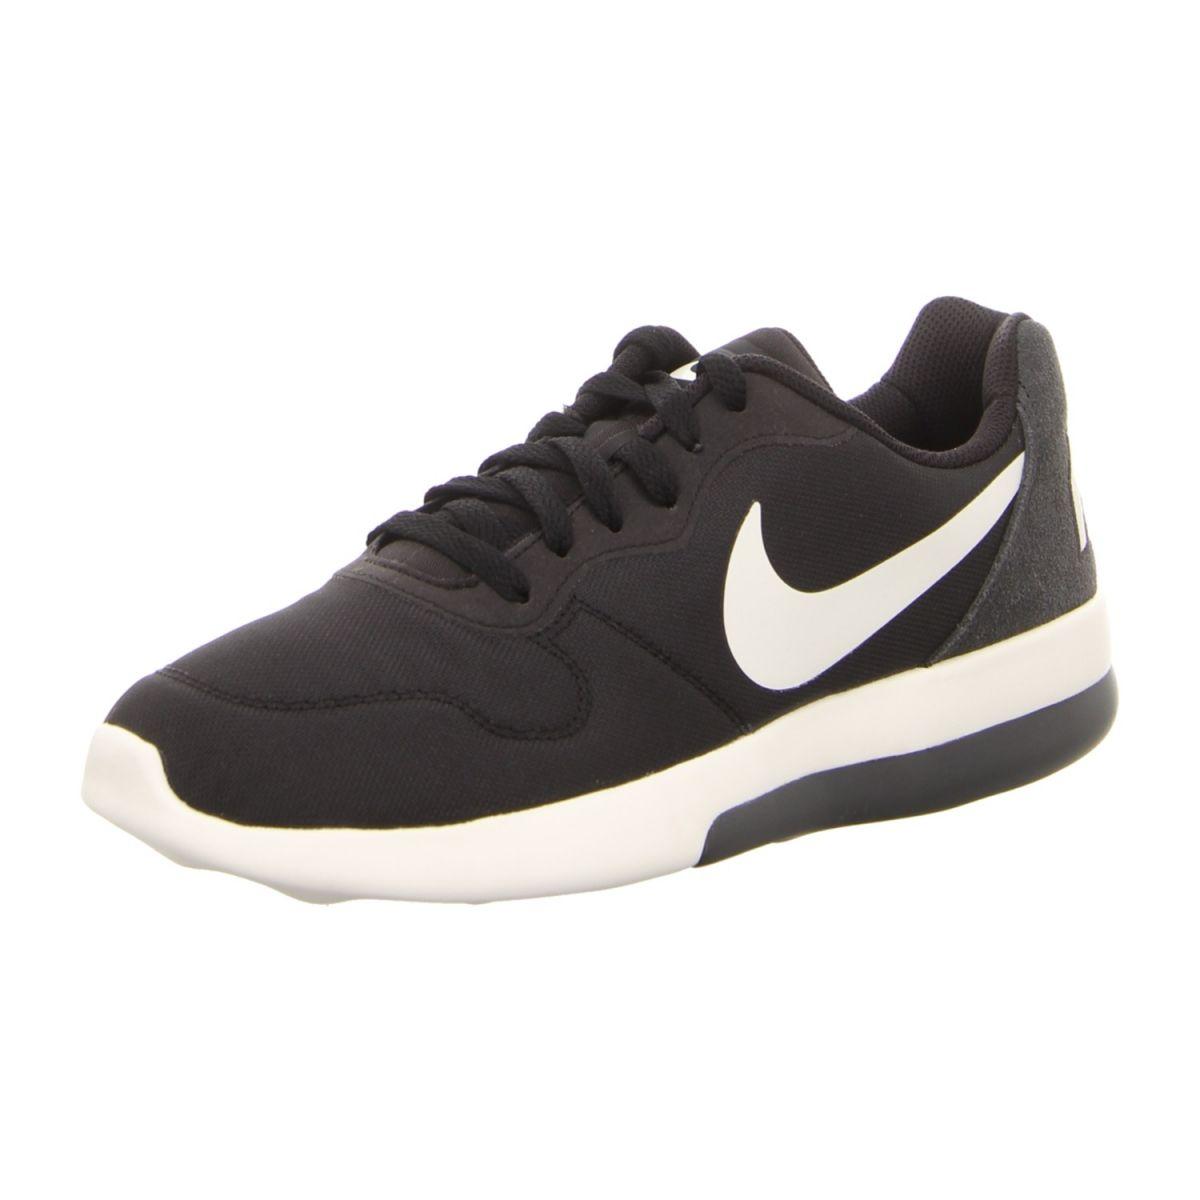 NEU: Nike Sneaker Schnürer MDRunner2LW - 844857 010 - black/sail-anthracite -